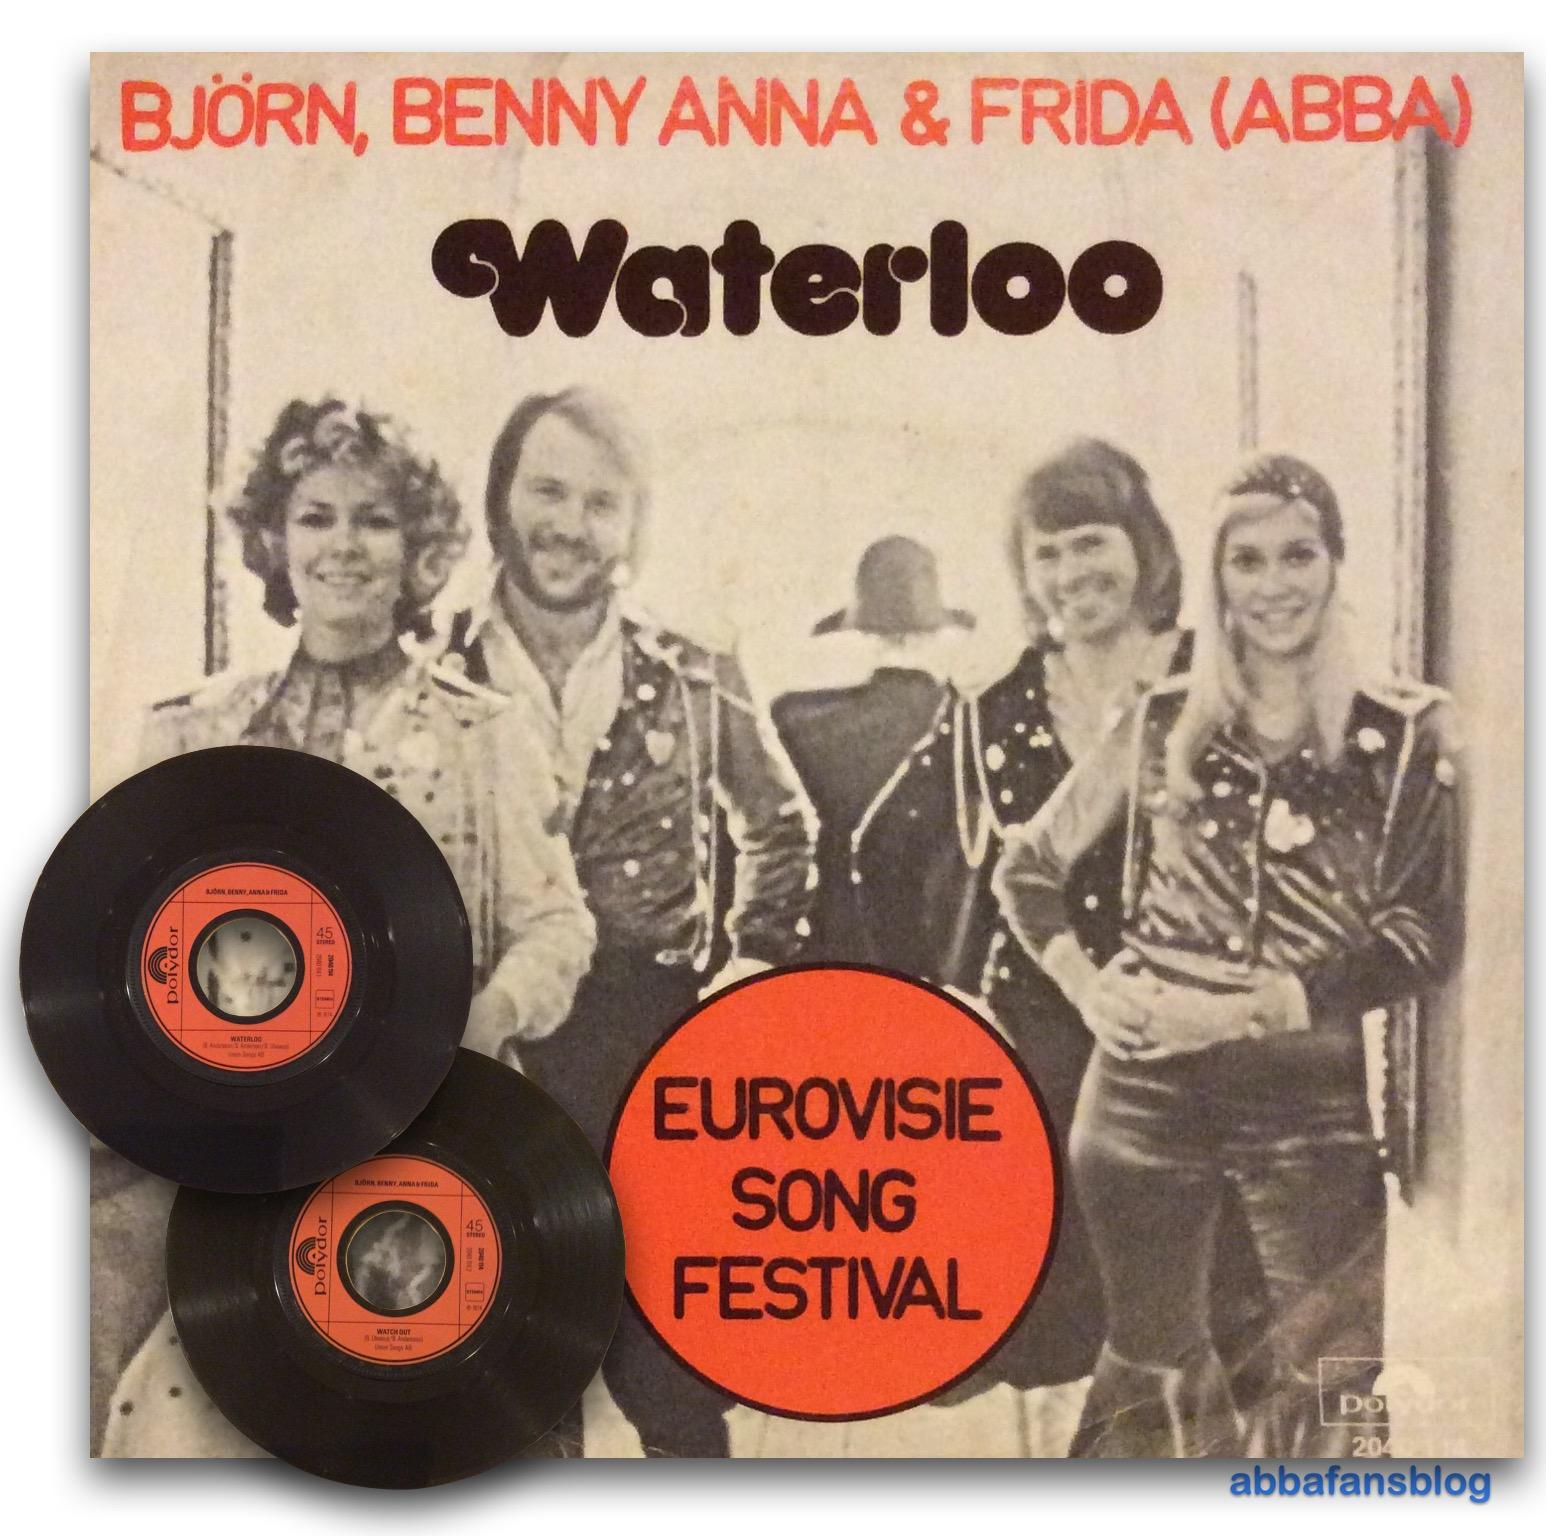 Waterloo singles Singles Selective Social Club Dance on October 19,,